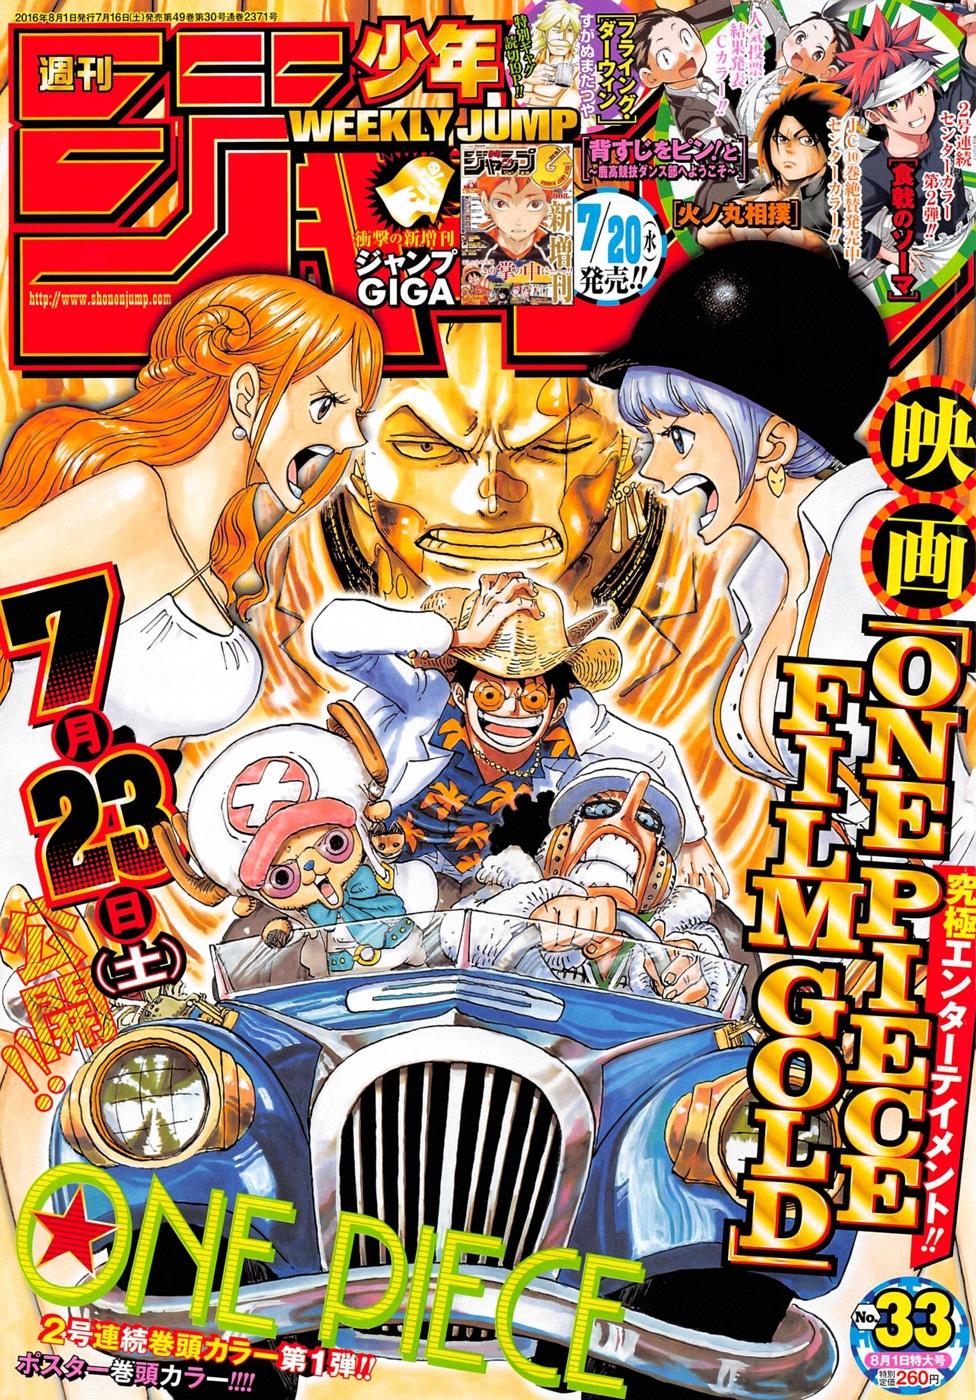 One Piece Chapter 832: Vương quốc Germa 000